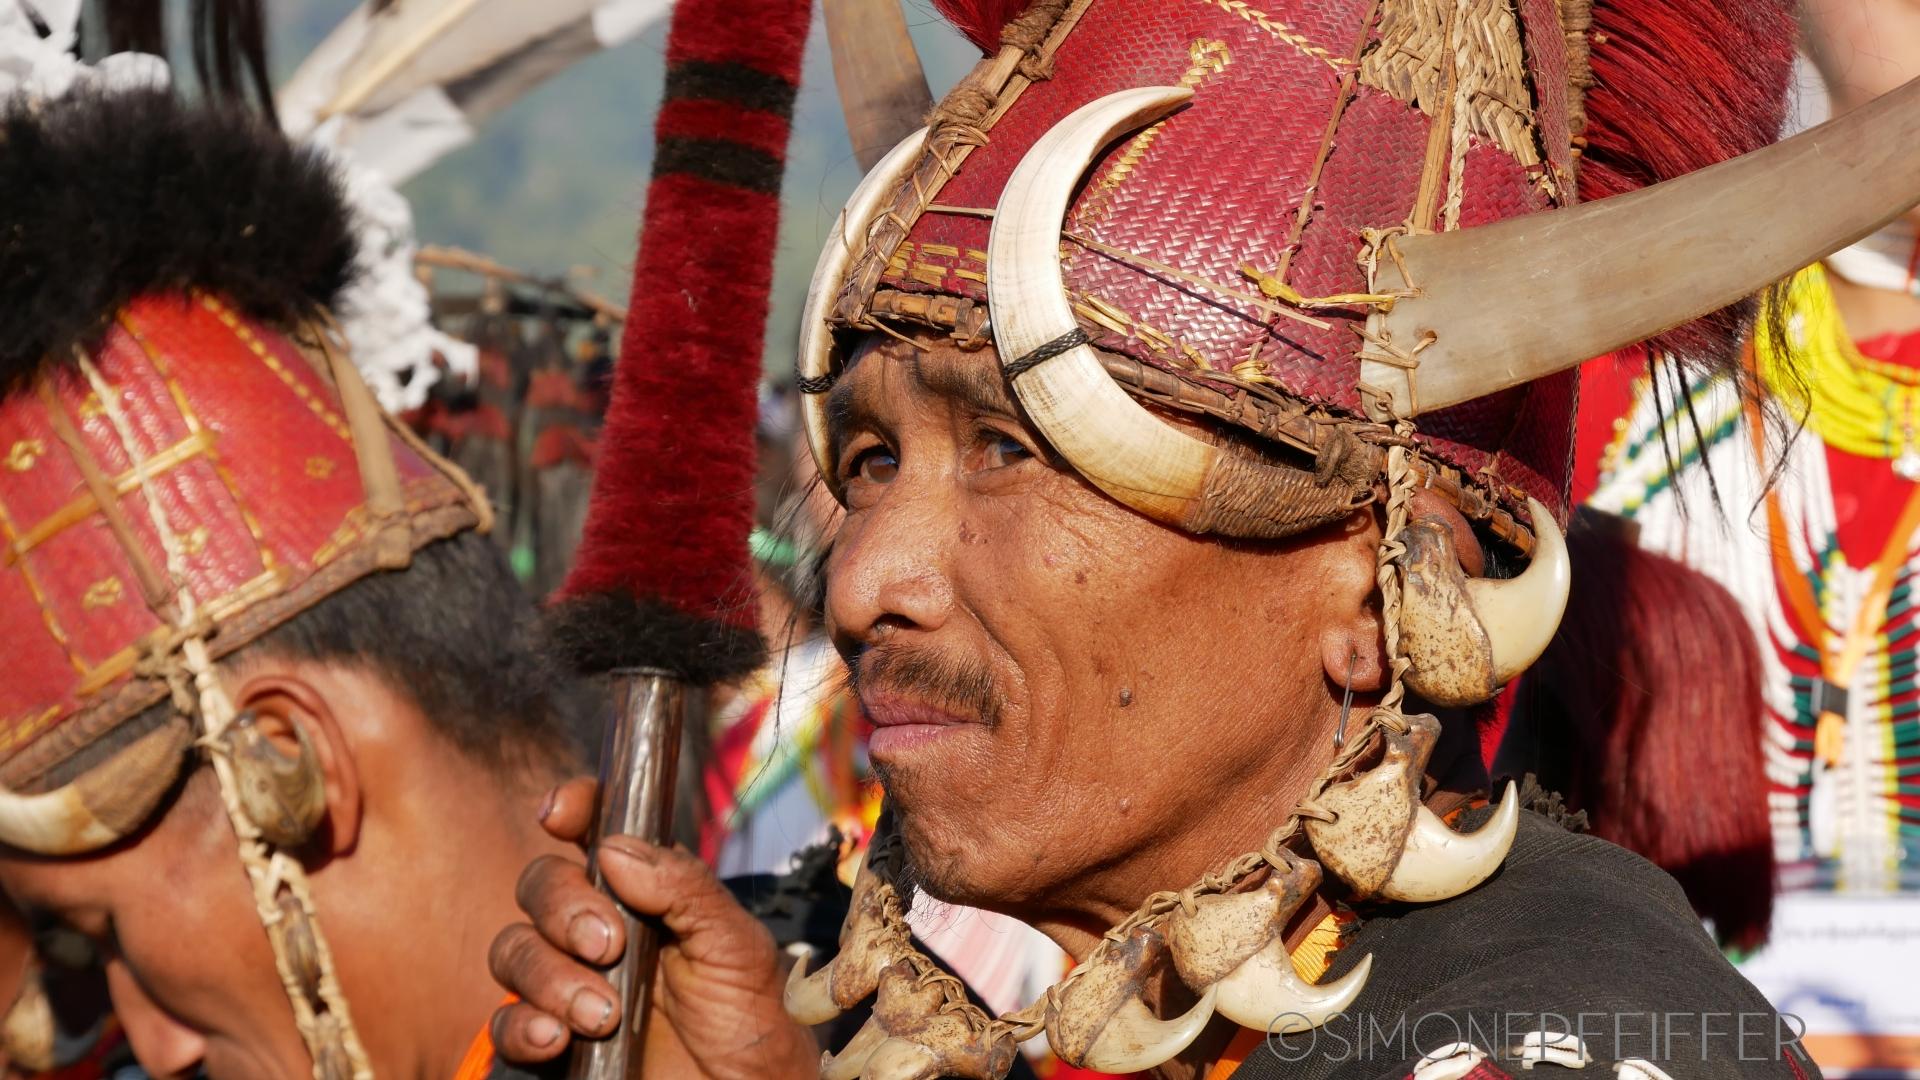 Erkundungsreisen in Asien und Afrika - Travel to the Naga People in Myanmar